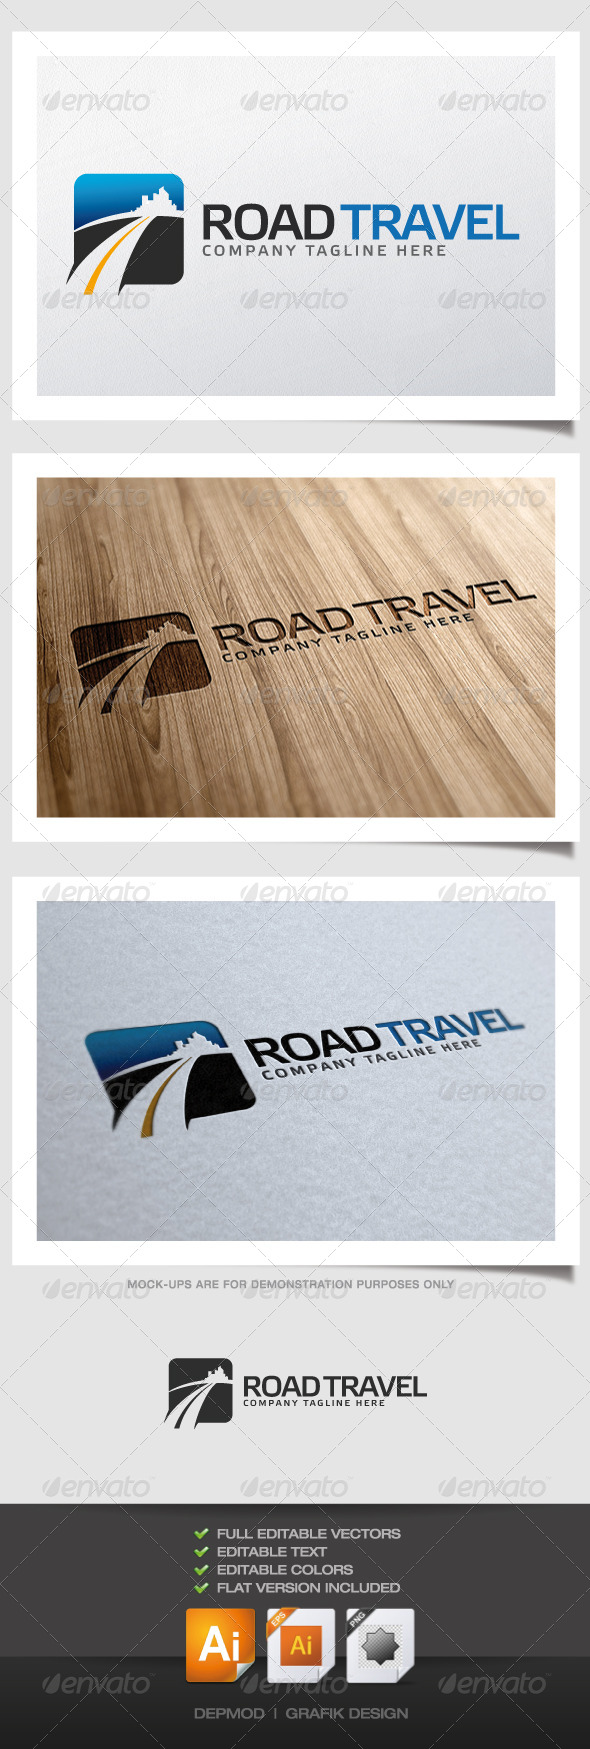 Road Travel Logo